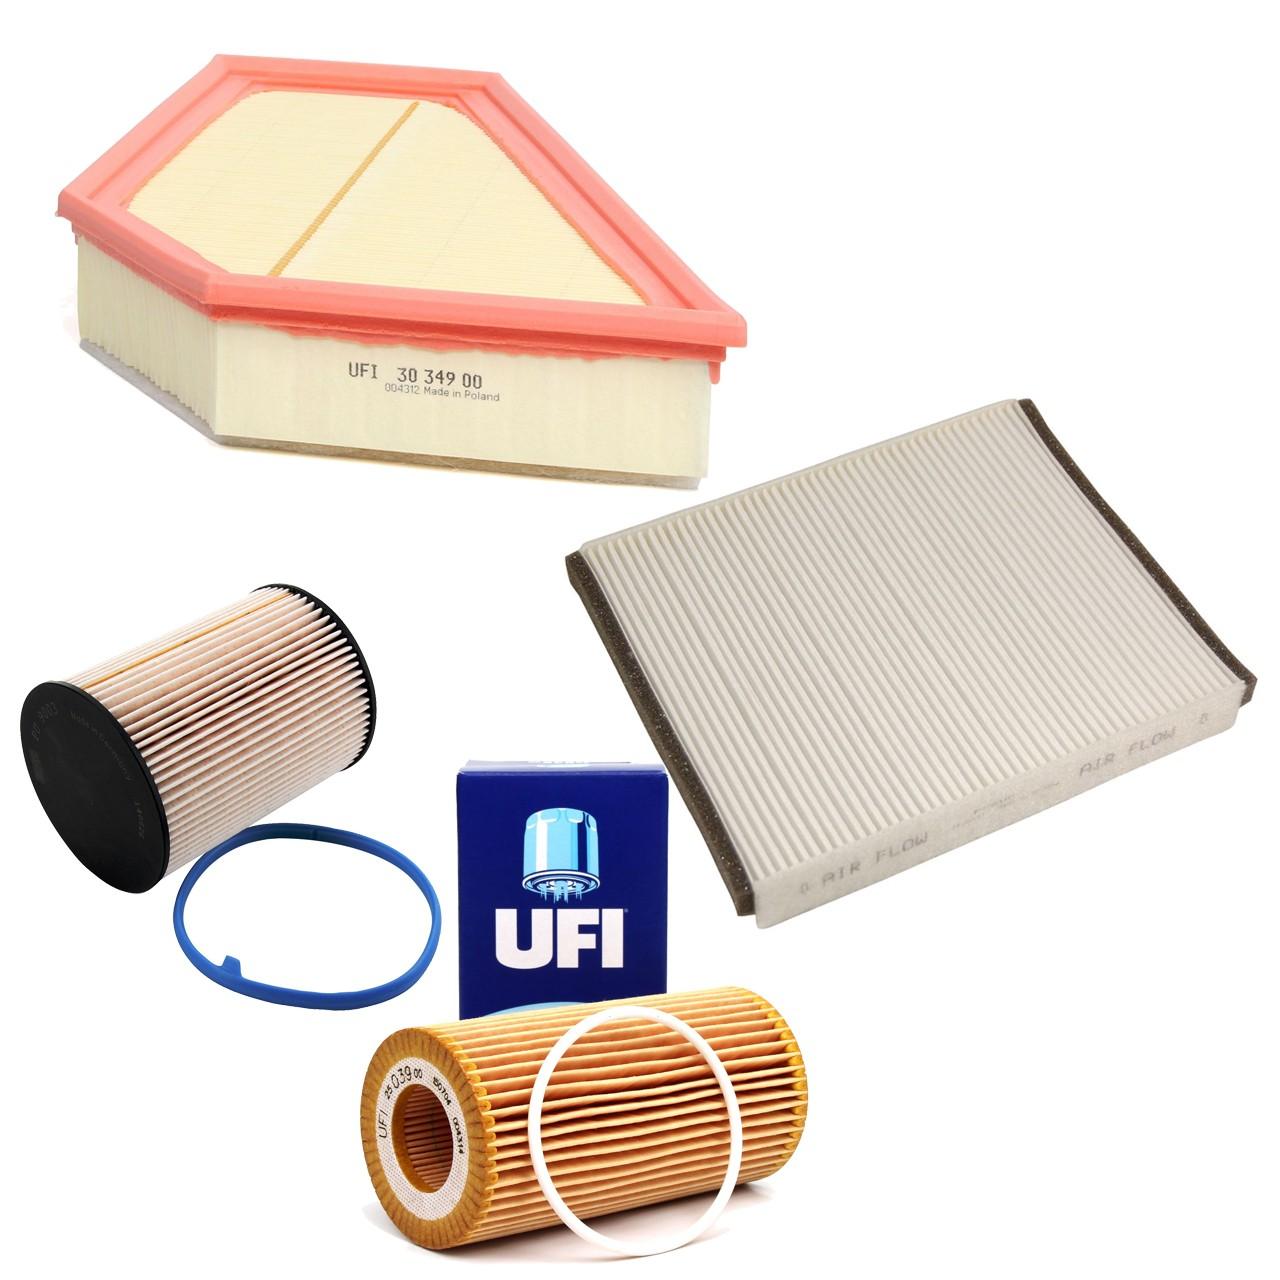 Inspektionskit Filterpaket für VOLVO C30 D5 C70 II 2.4D D5 V50 2.4DS 2.4Tdi